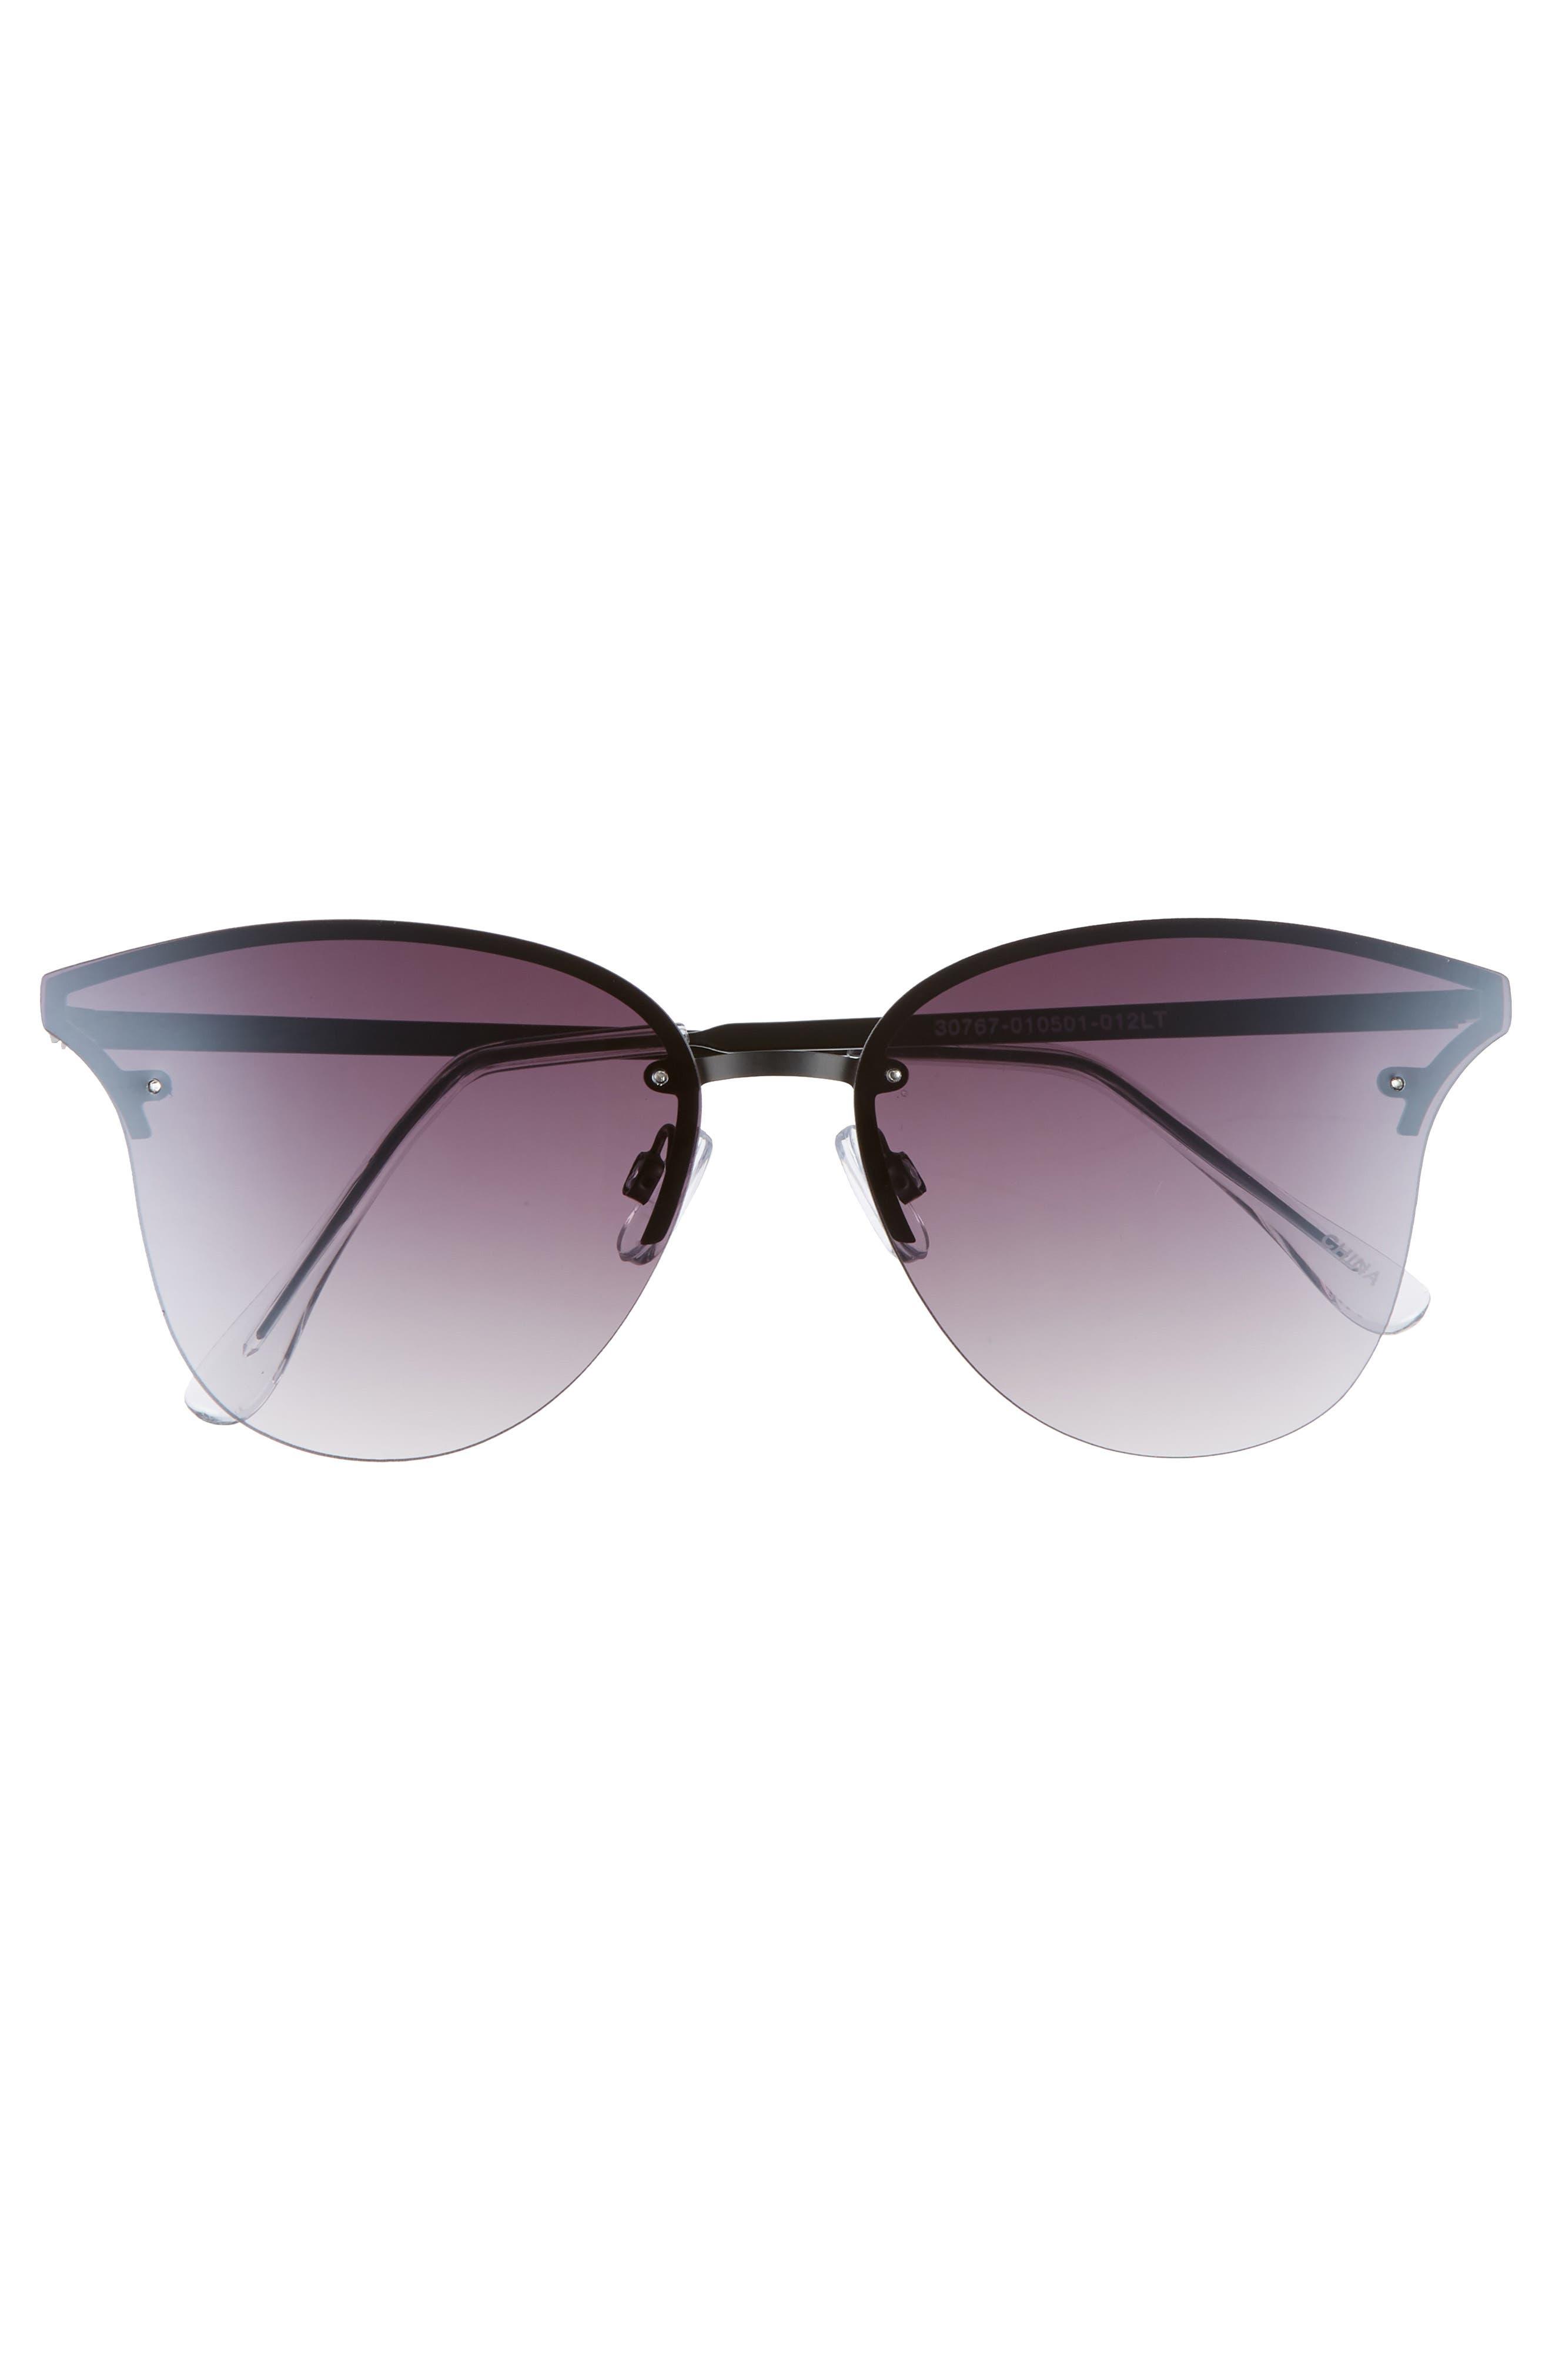 61mm Rimless Cat Eye Sunglasses,                             Alternate thumbnail 3, color,                             001